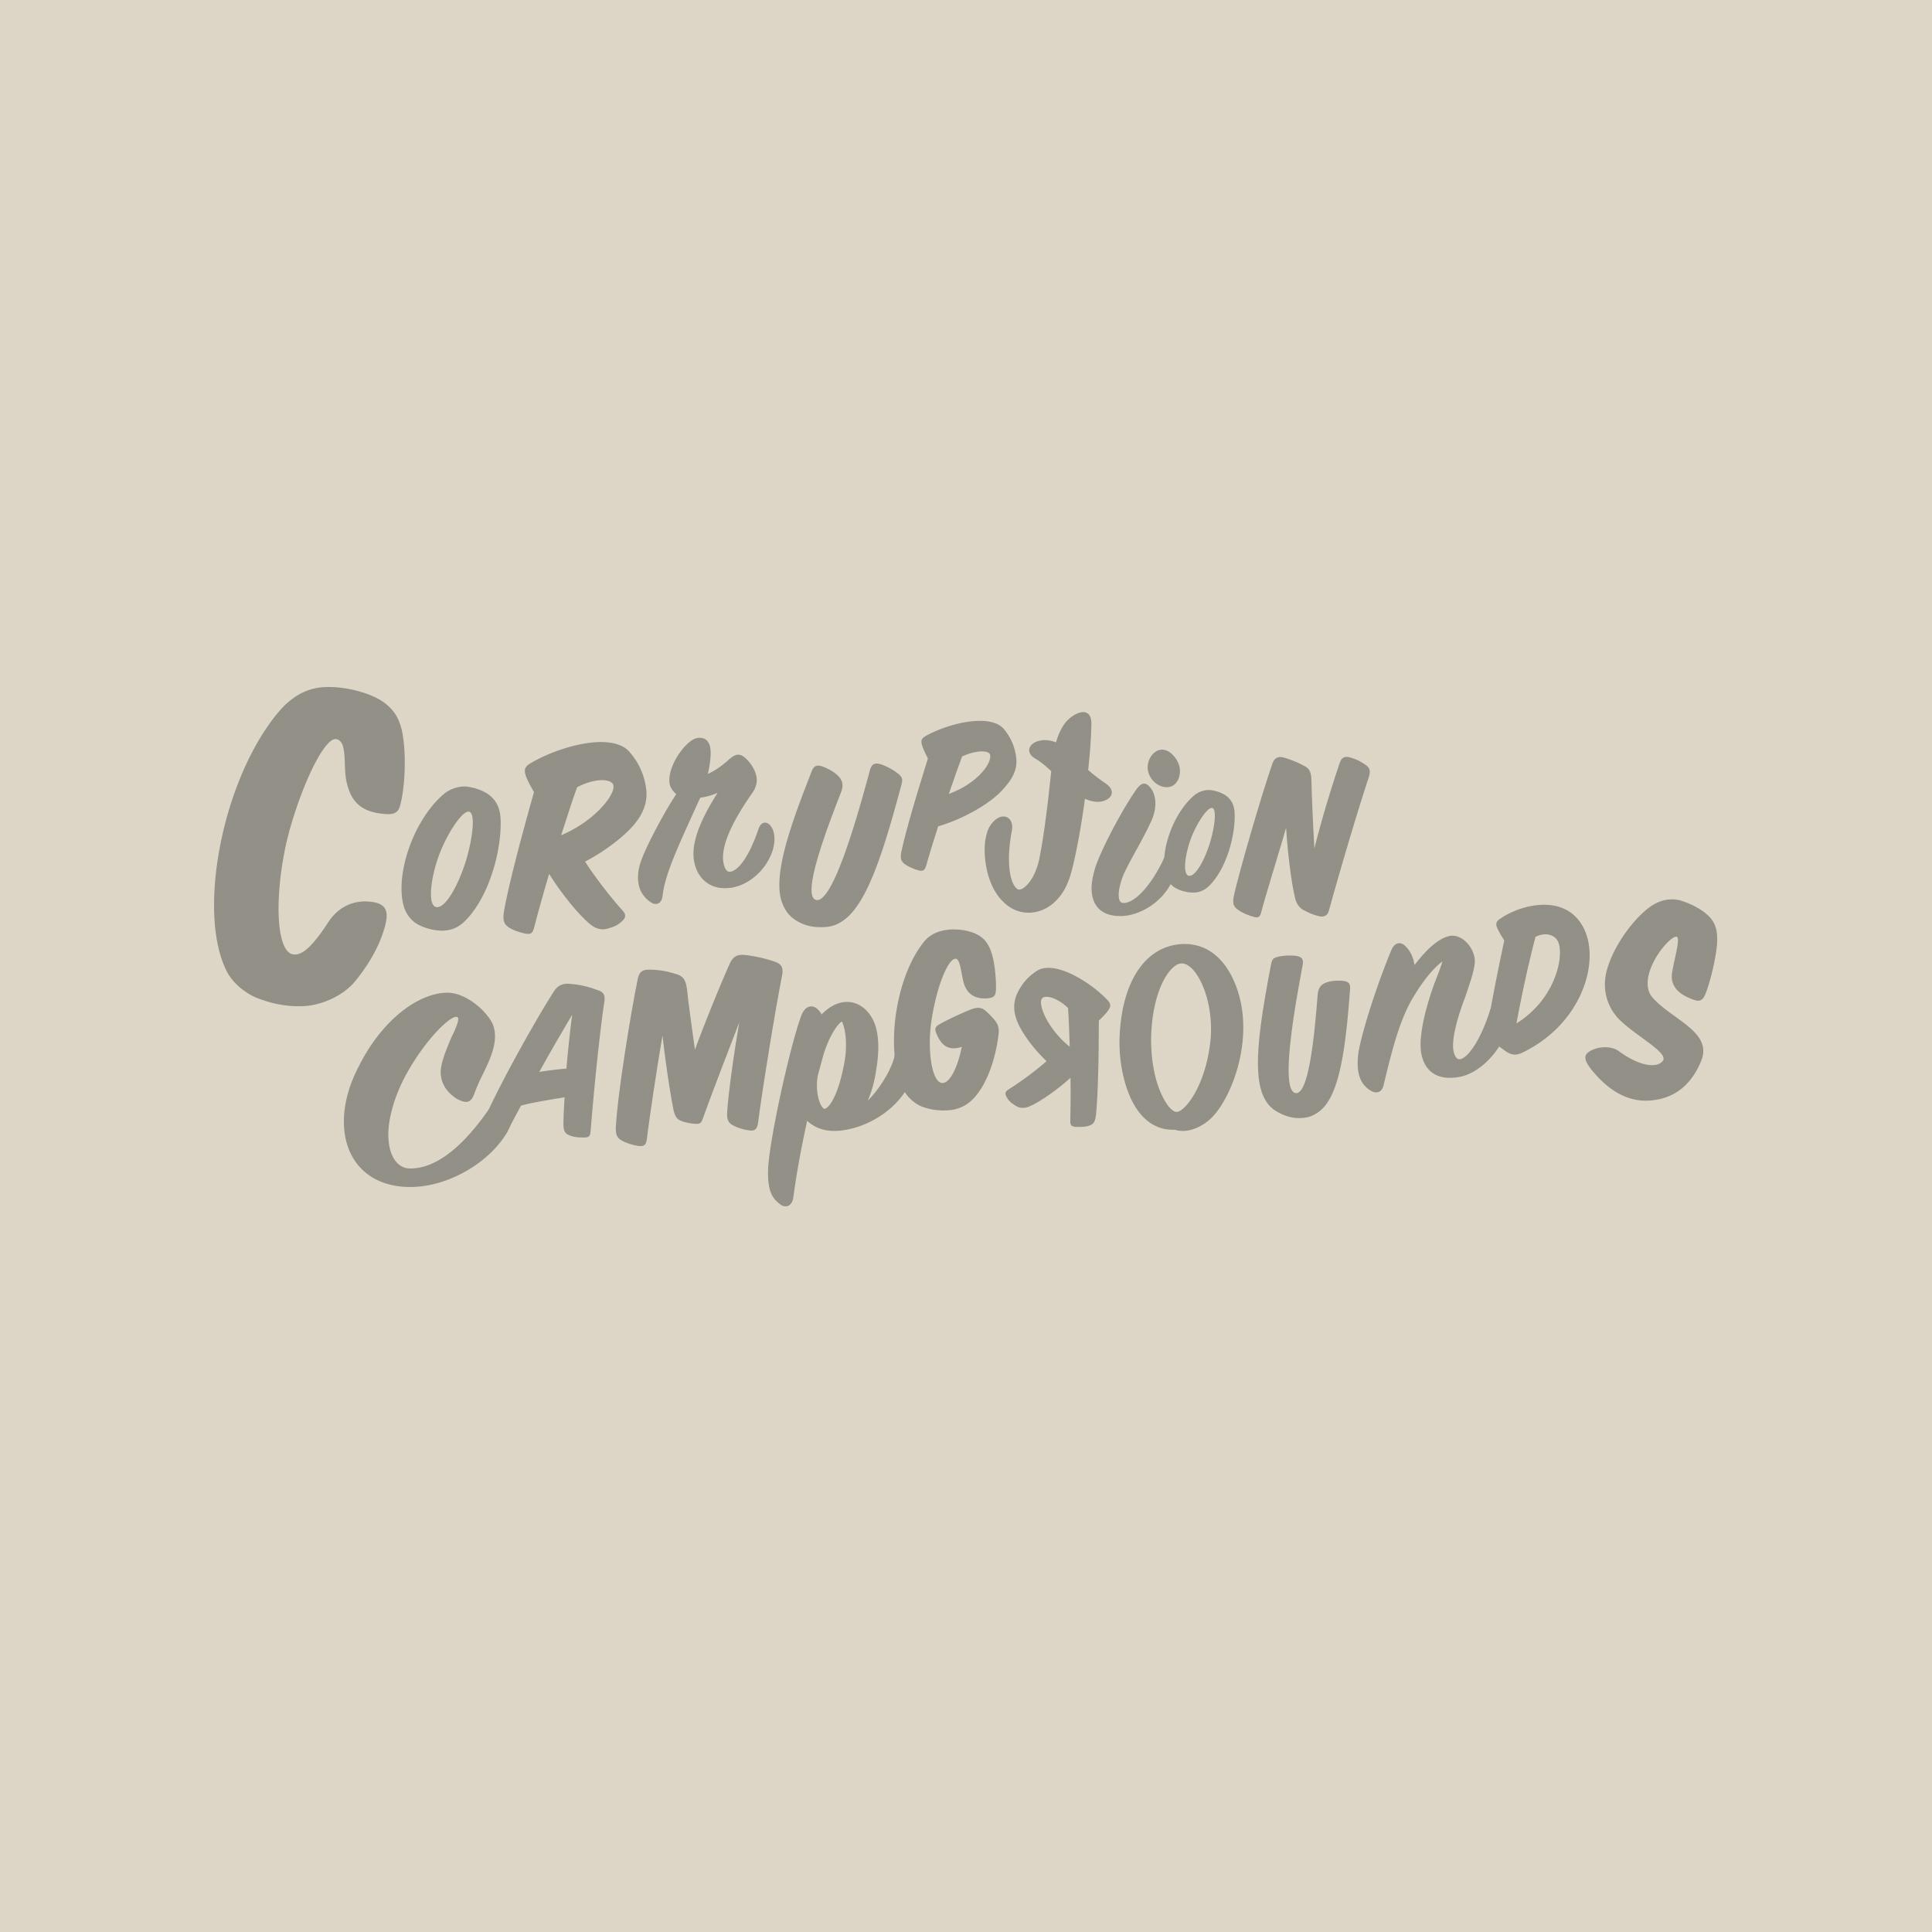 logos_0040_corruption_3.jpg